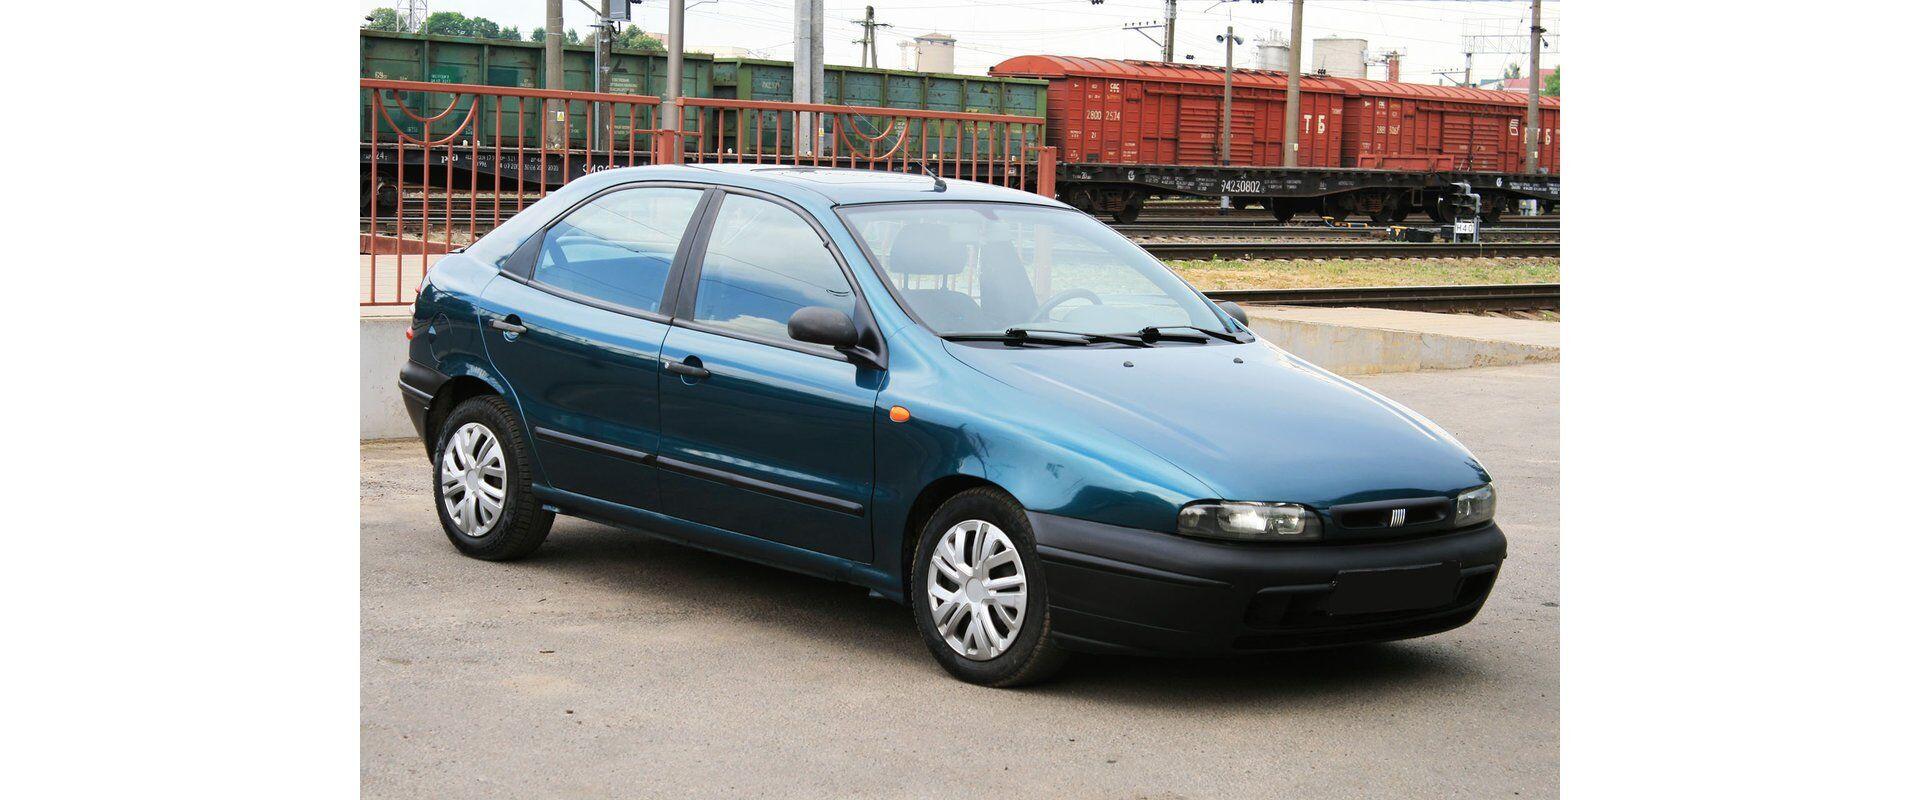 Fiat Brava (1997)